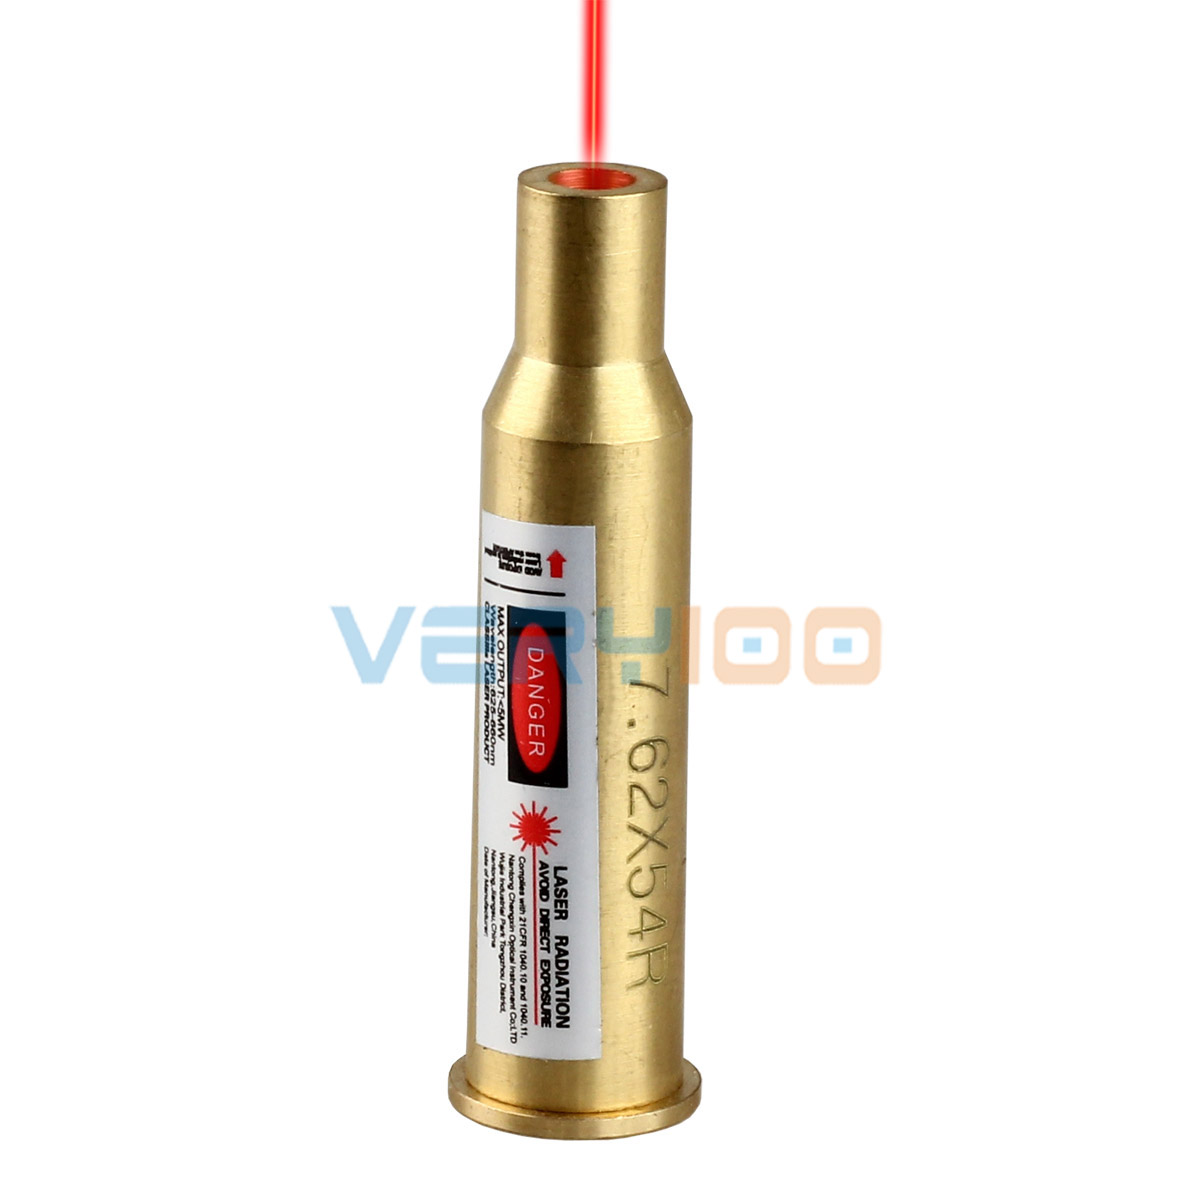 7.62 x 54R Laser Cartridge Bore Sight Boresighter Brass Sighter